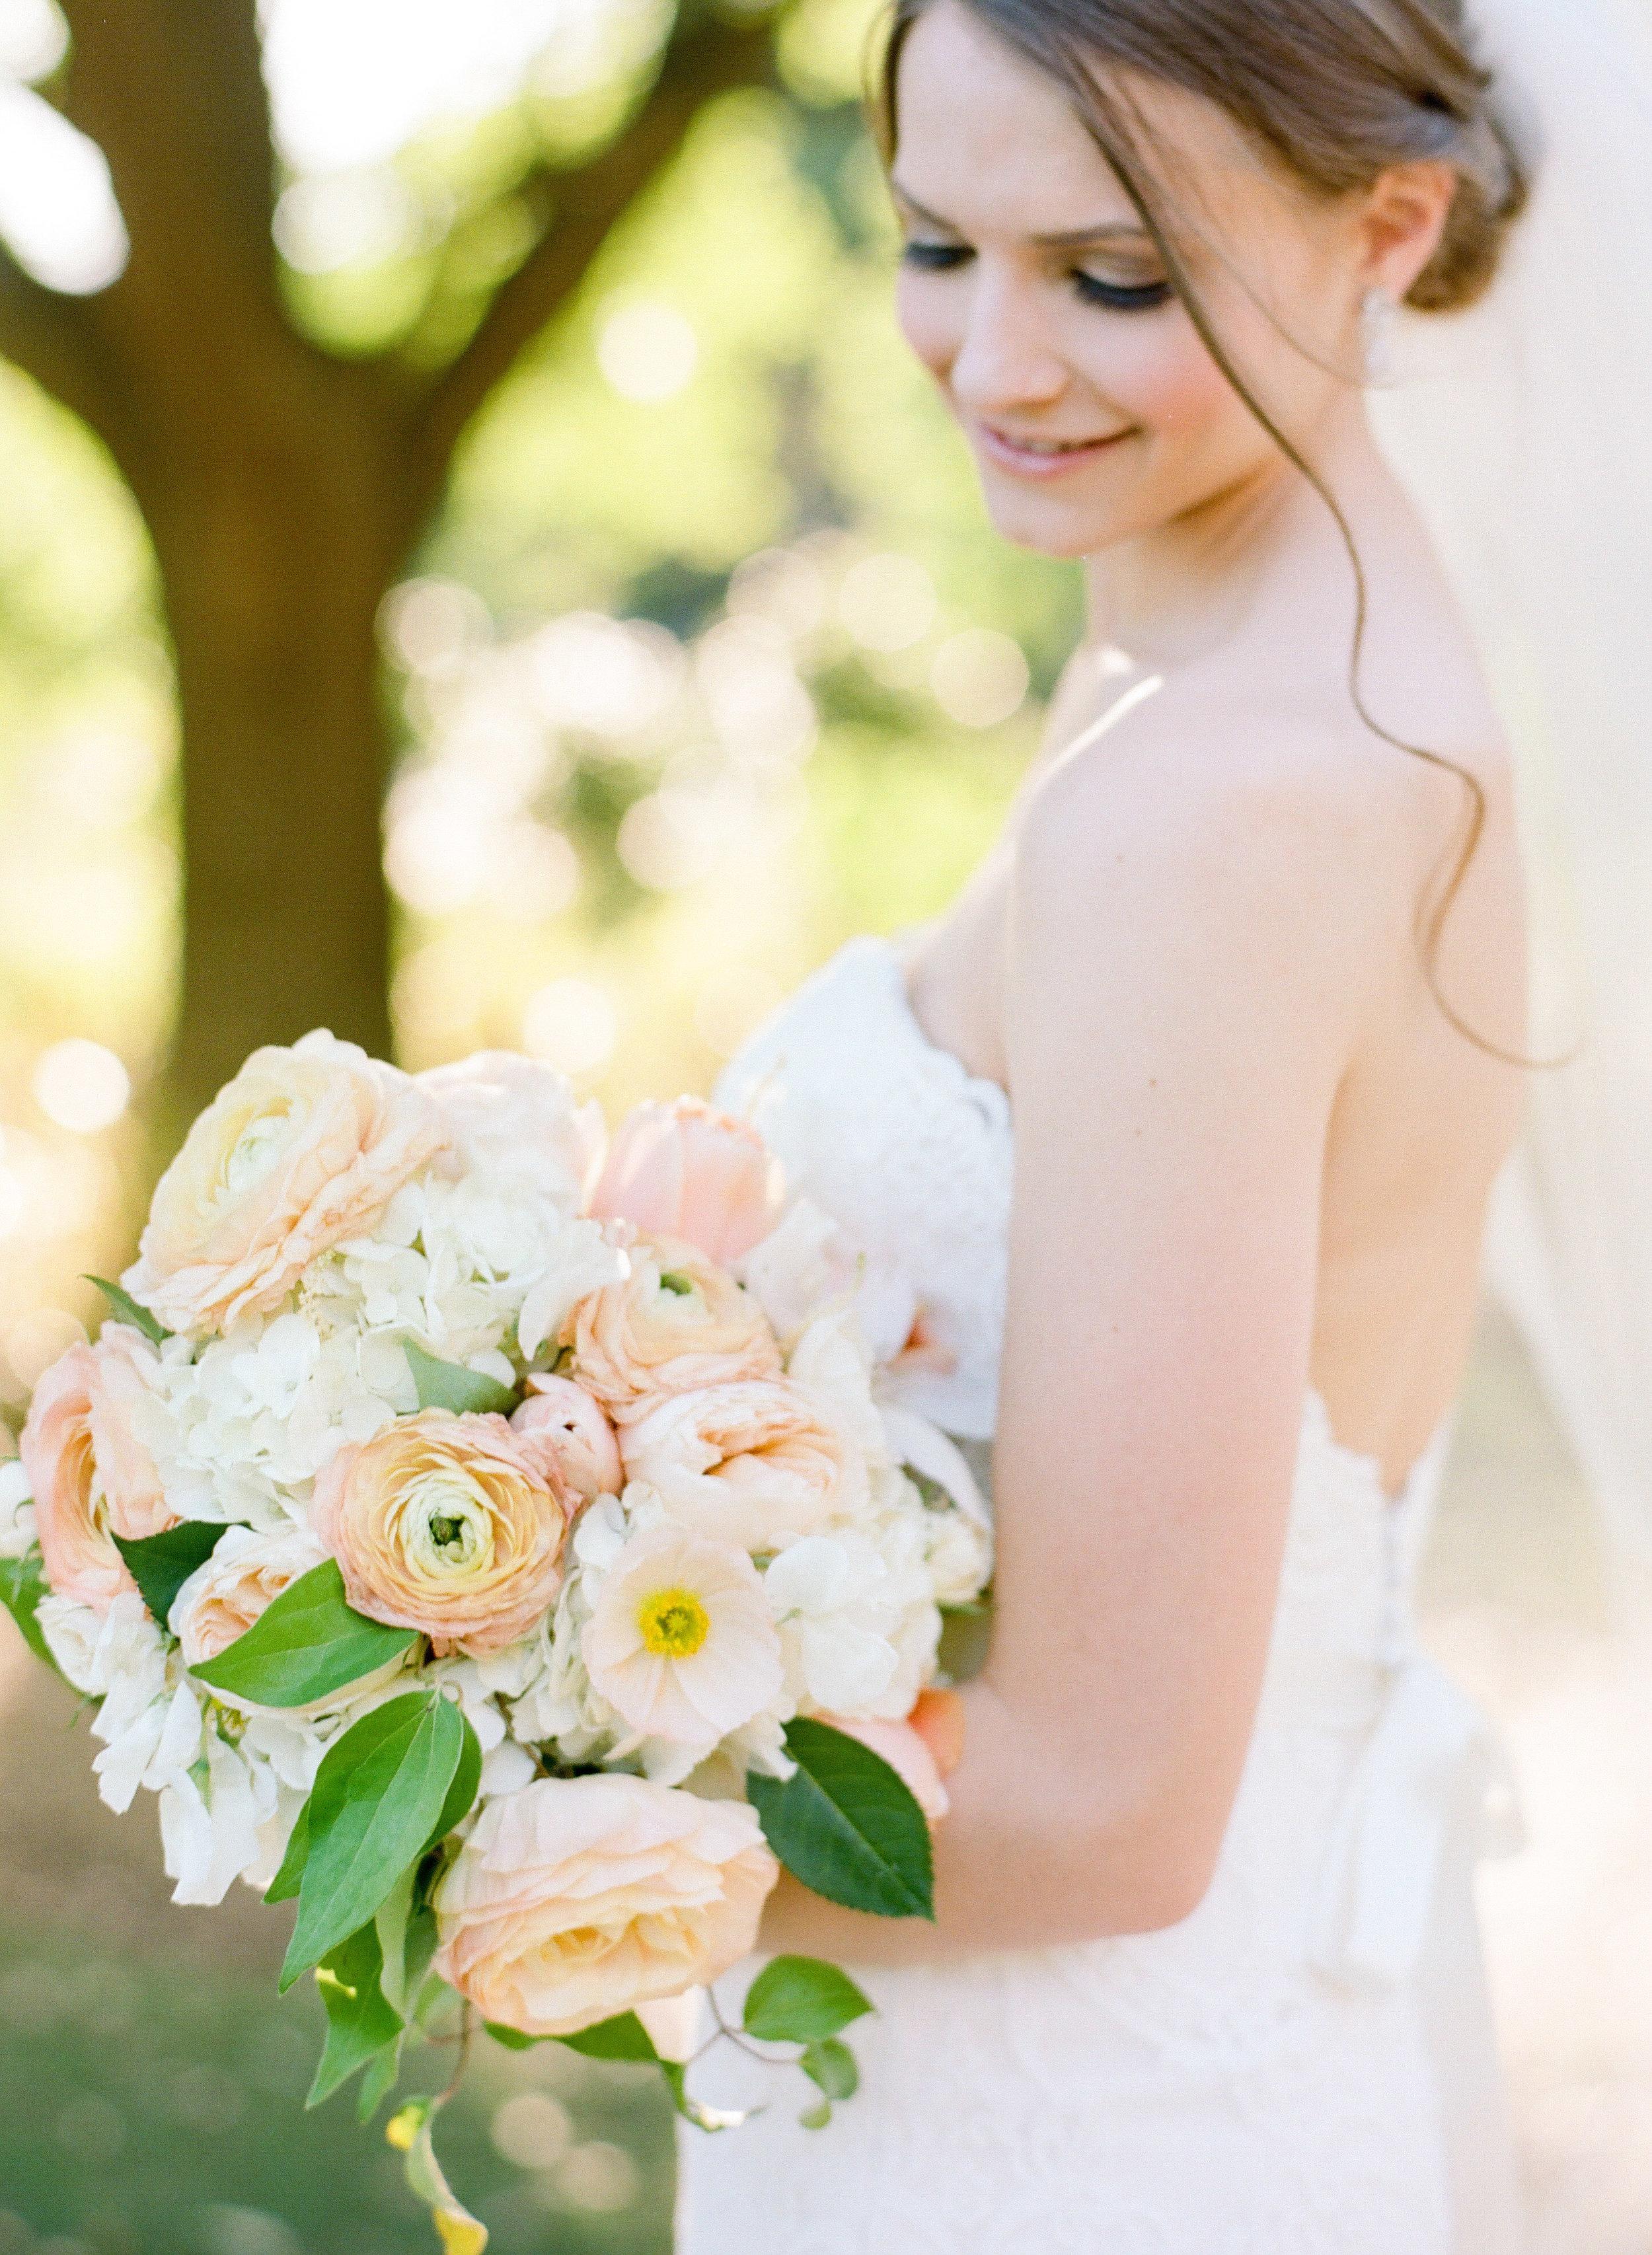 Houston-Wedding-Photographer-Film-Fine-Art-Bridals-Dana+Fernandez-Photography-8.jpg